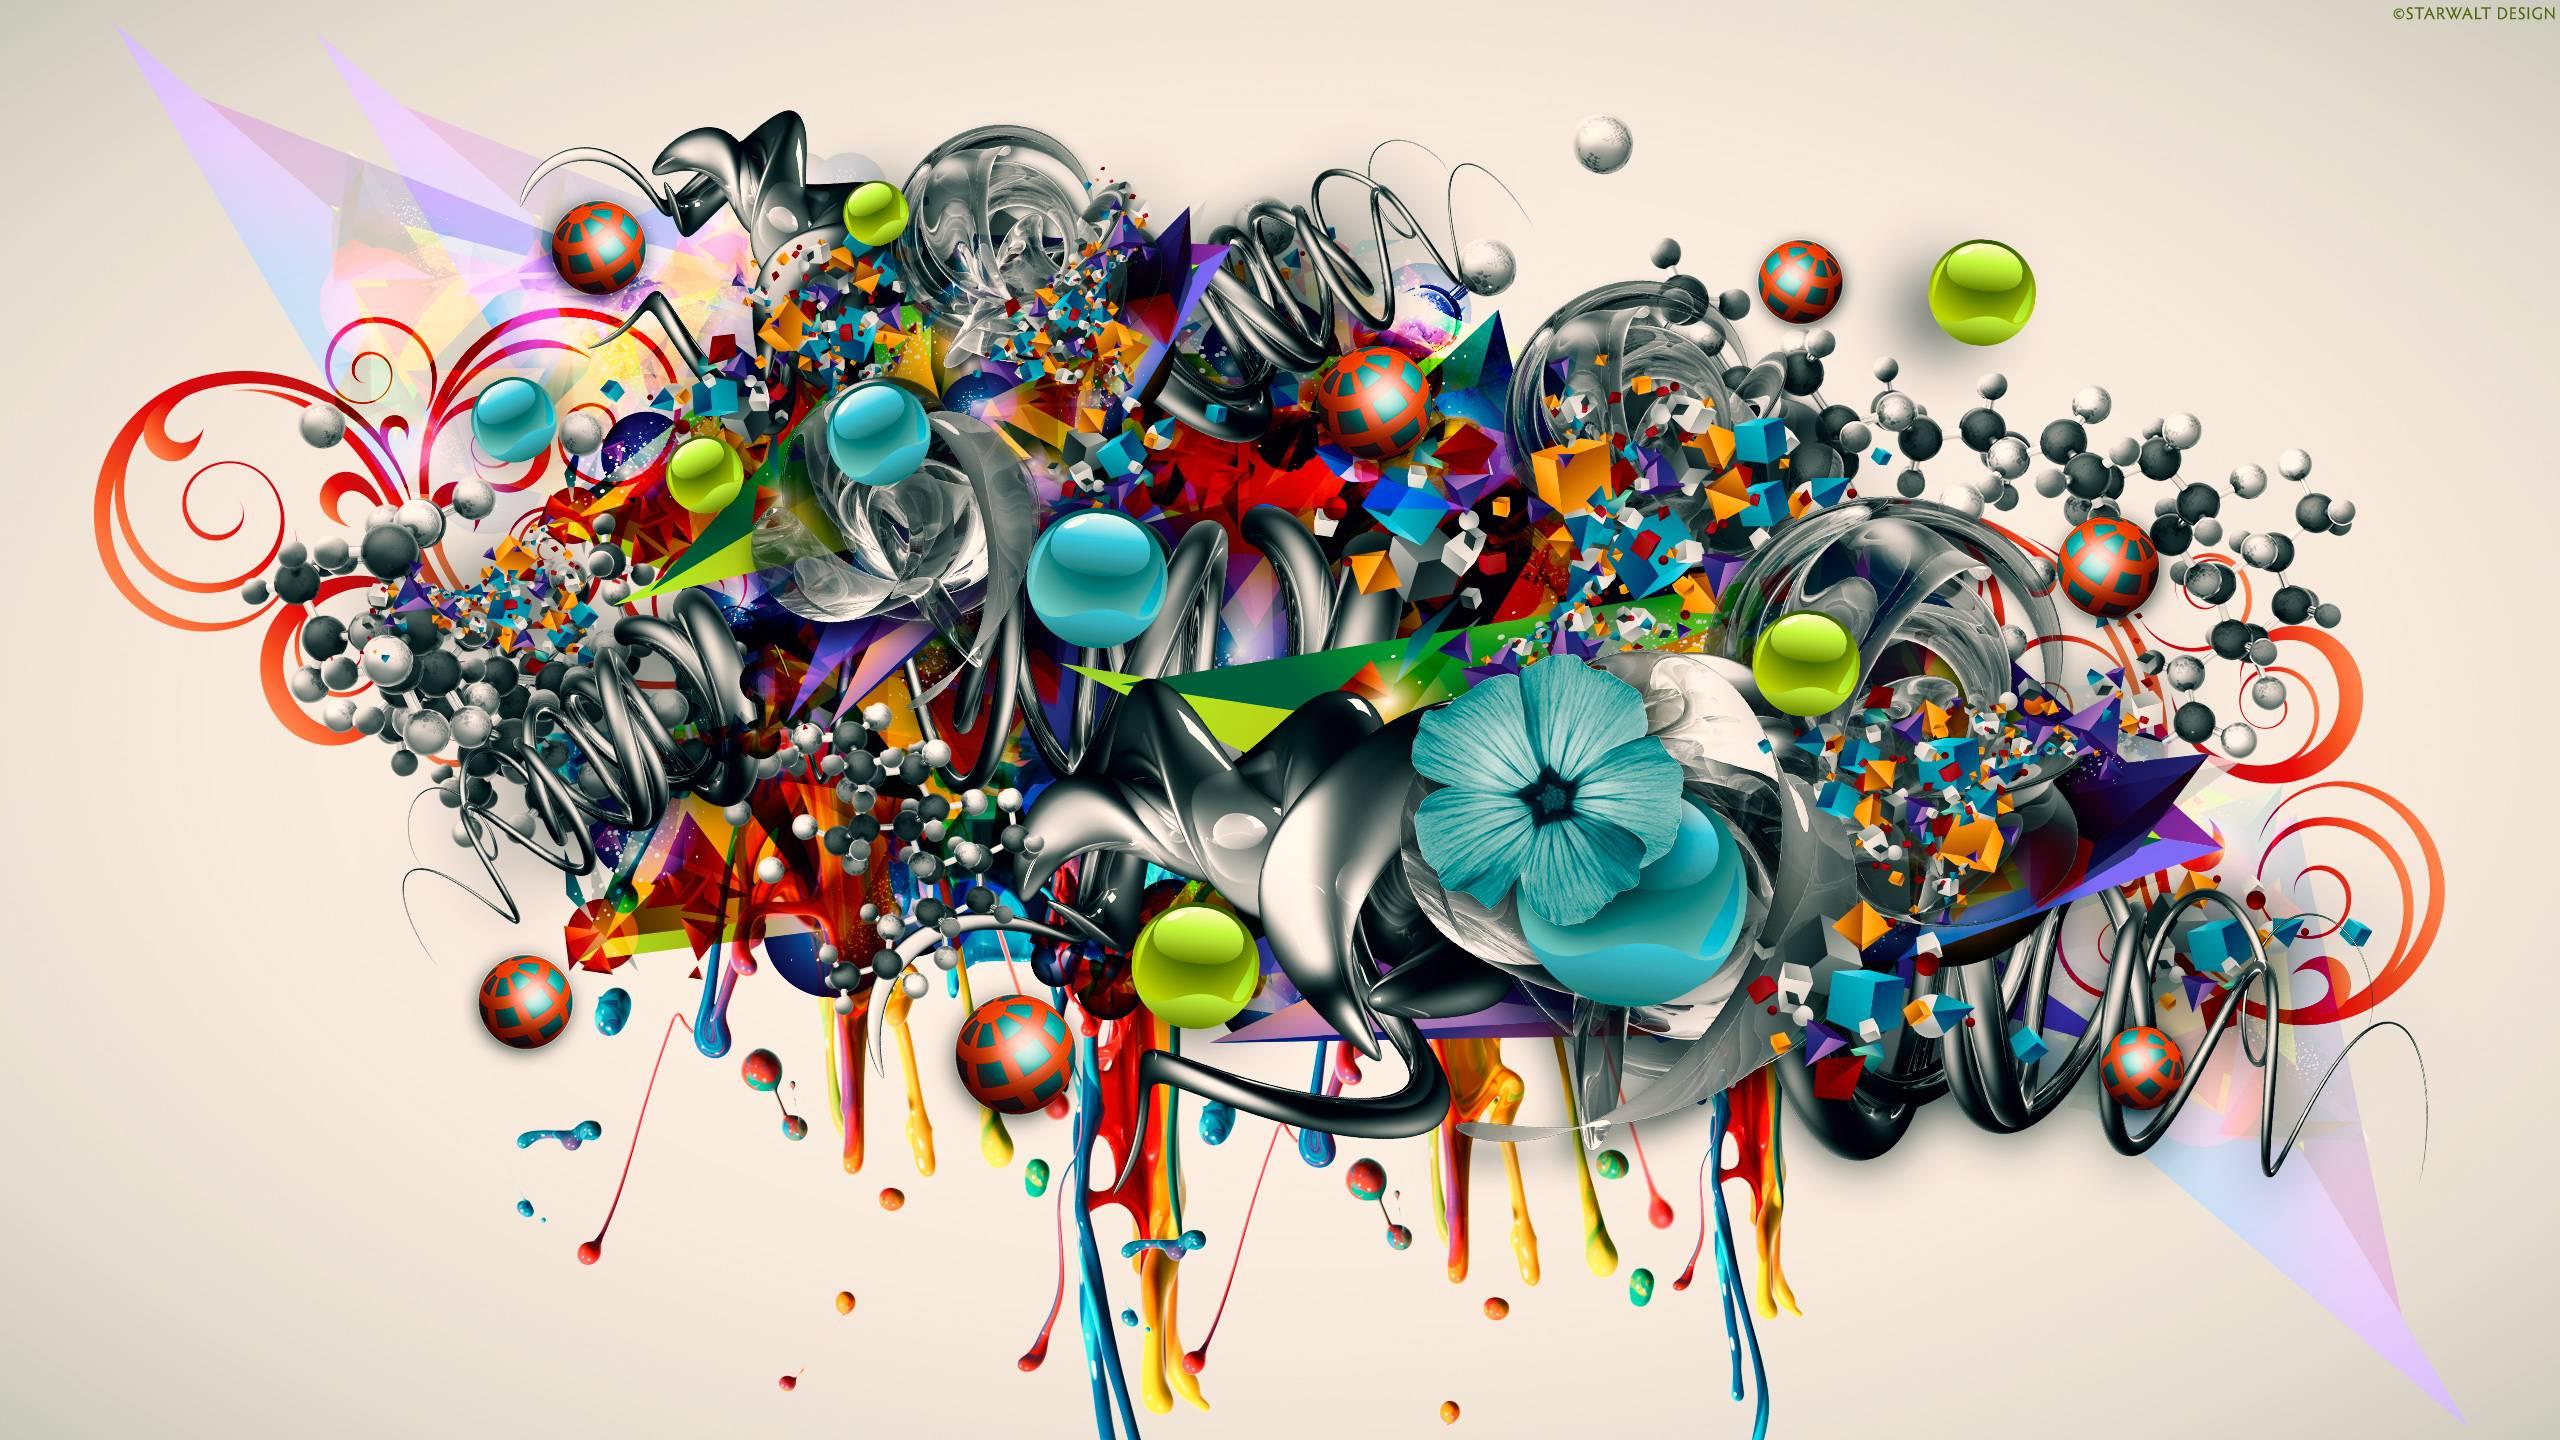 Graffiti Computer Wallpapers Desktop Backgrounds 2560x1440 ID 2560x1440